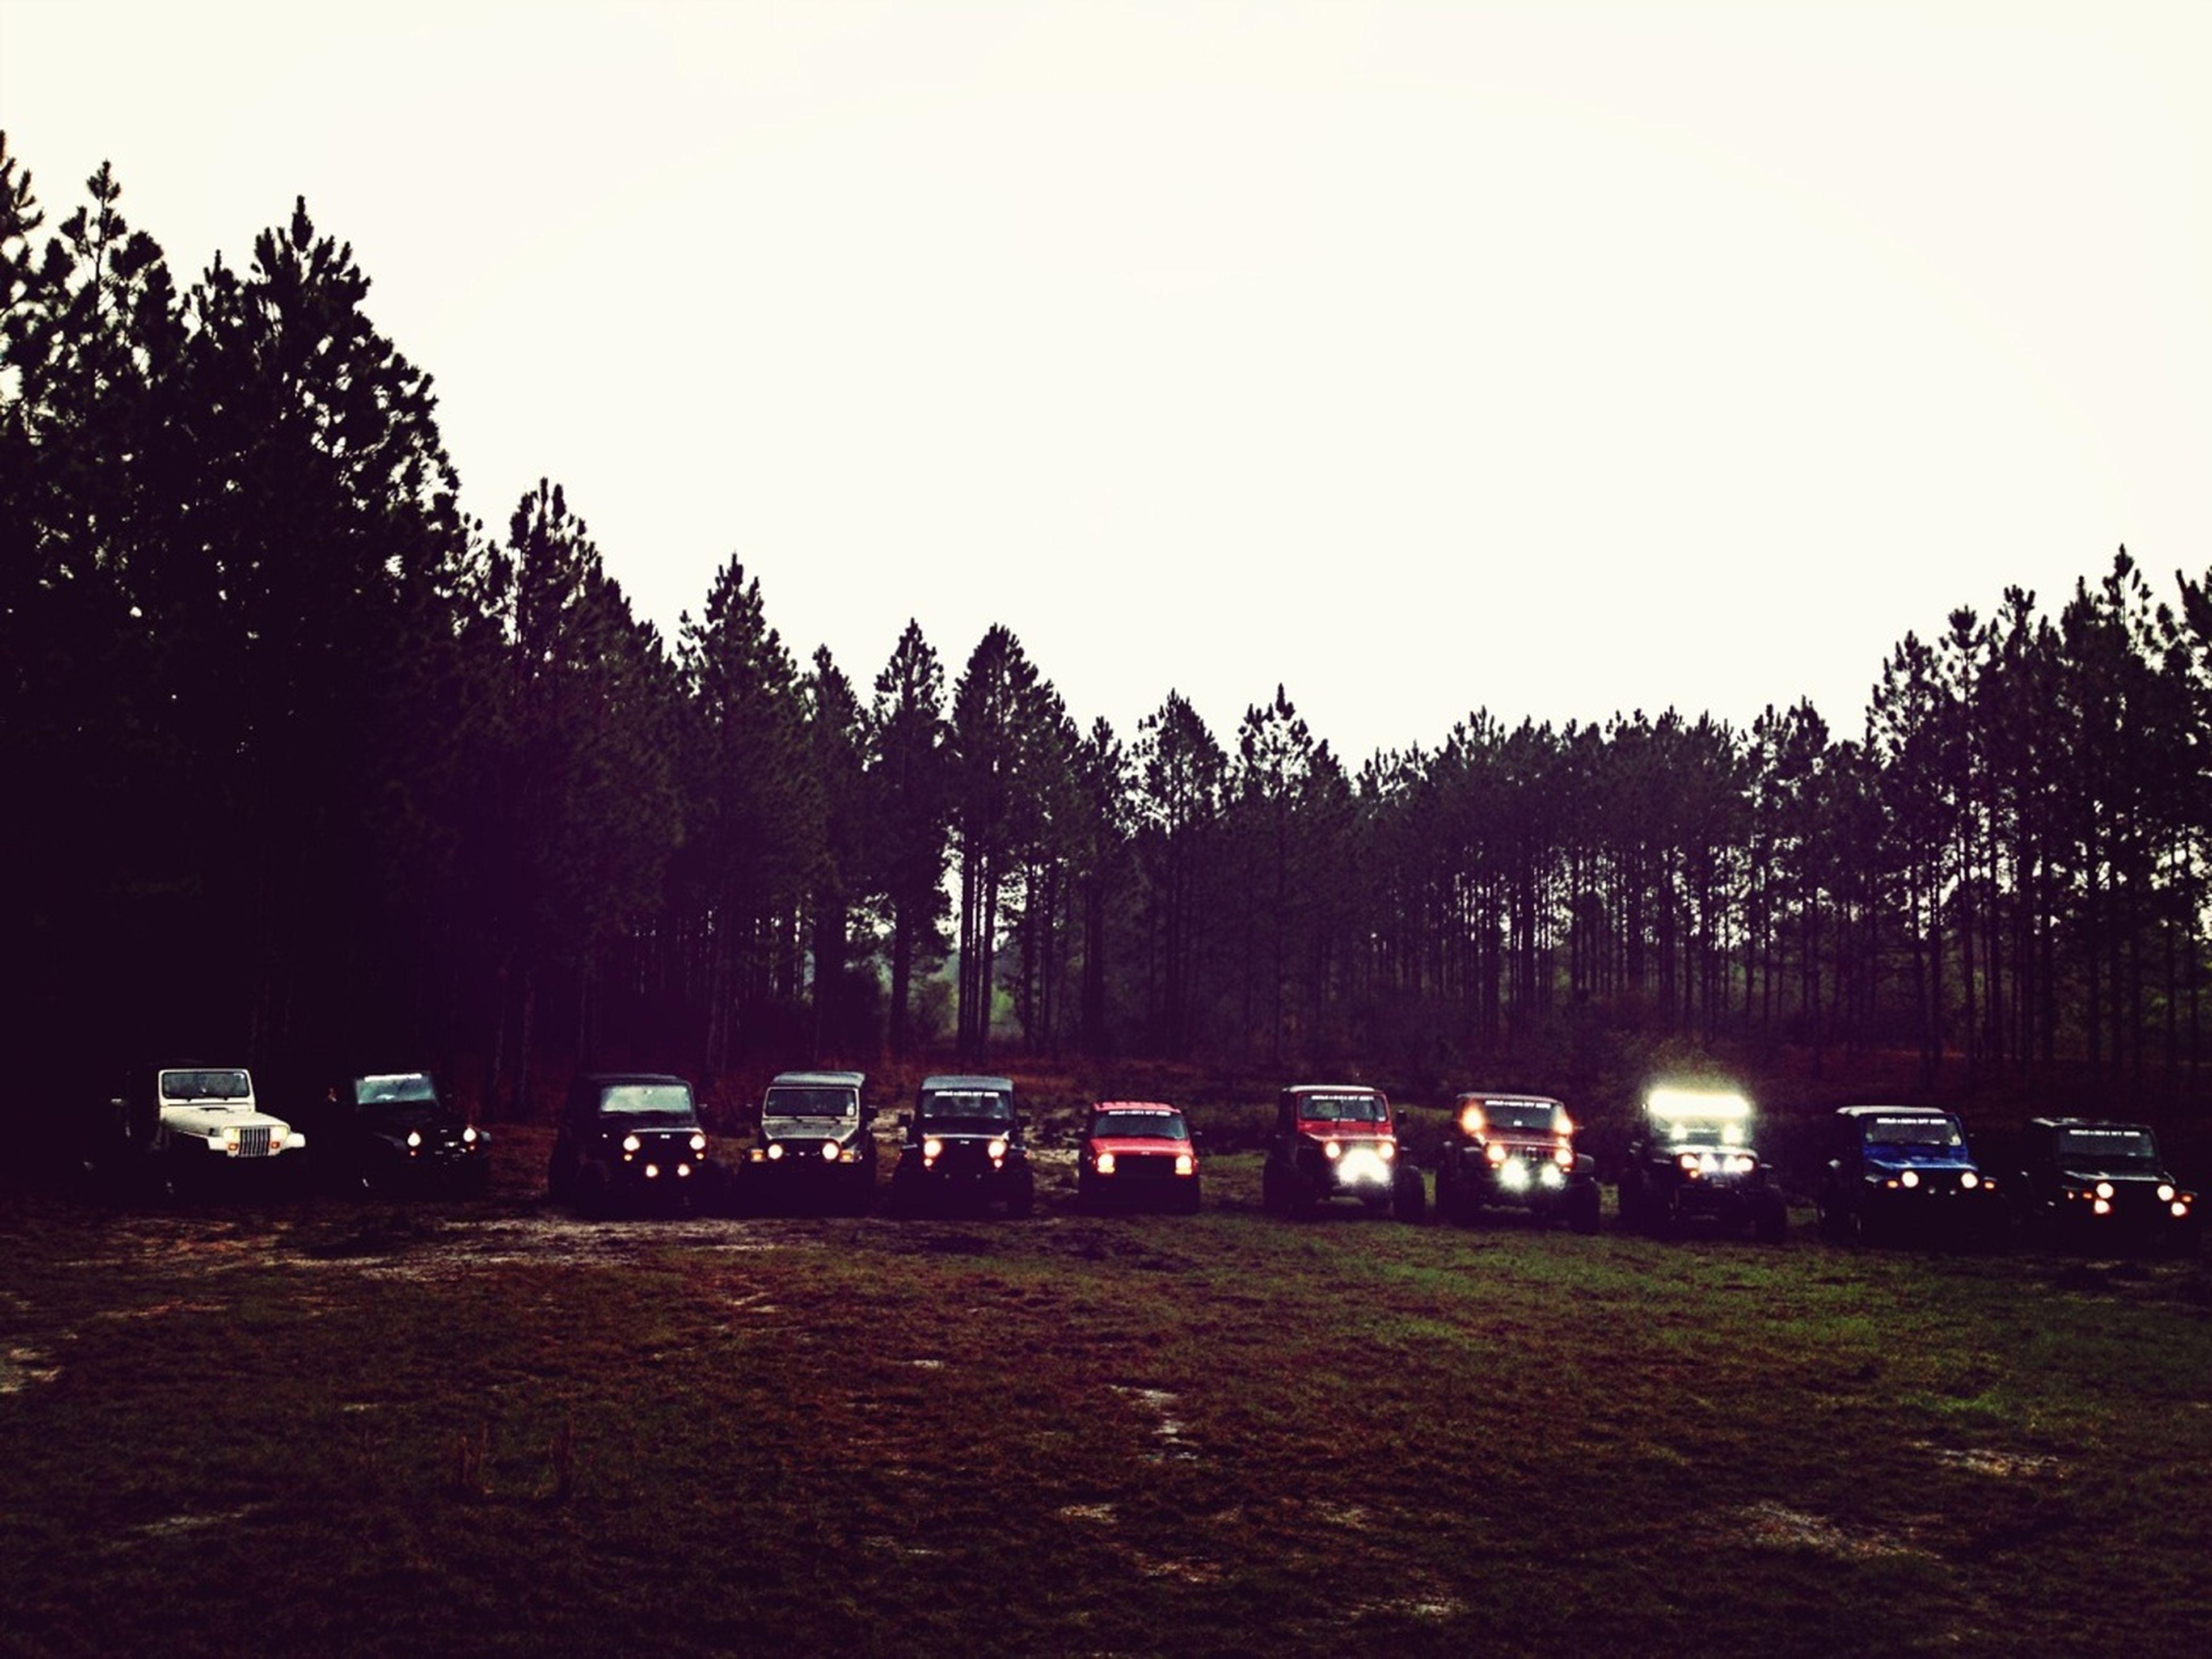 Camp Blanding